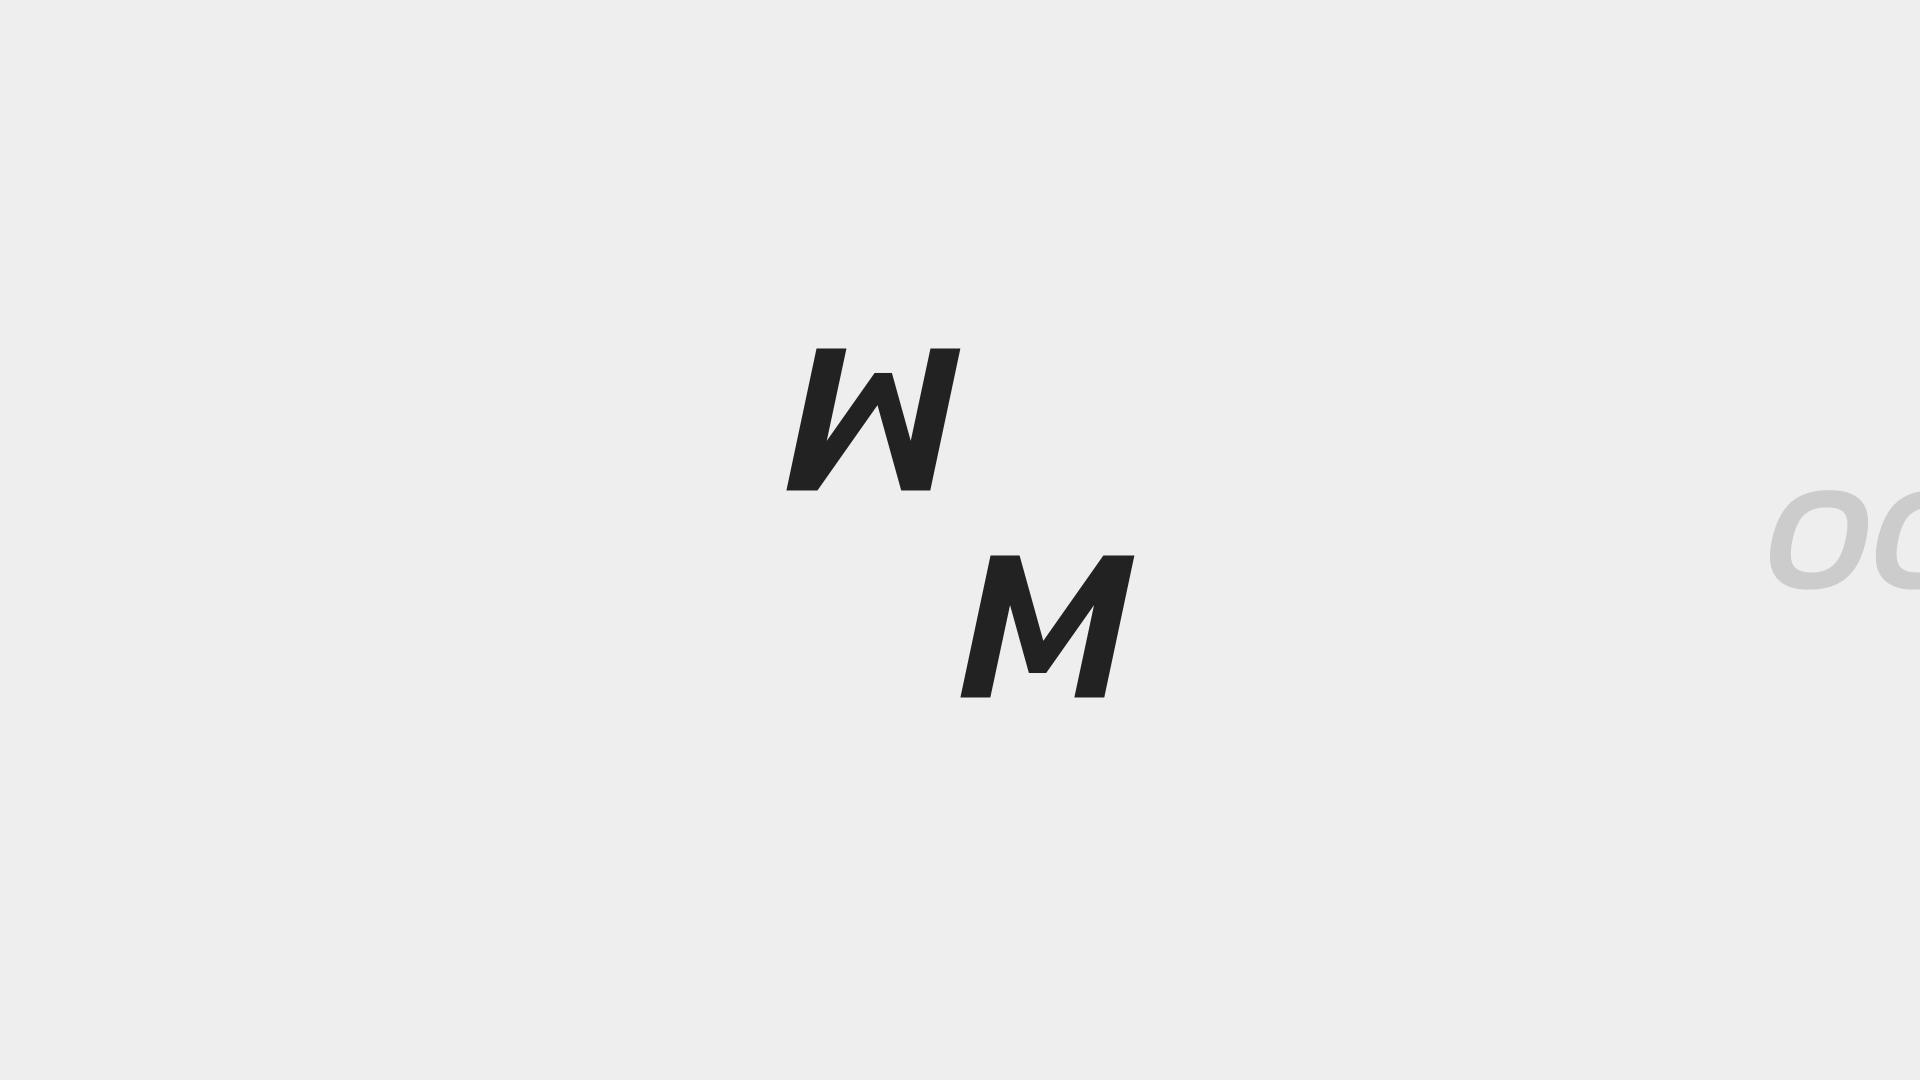 WOOMARK_4